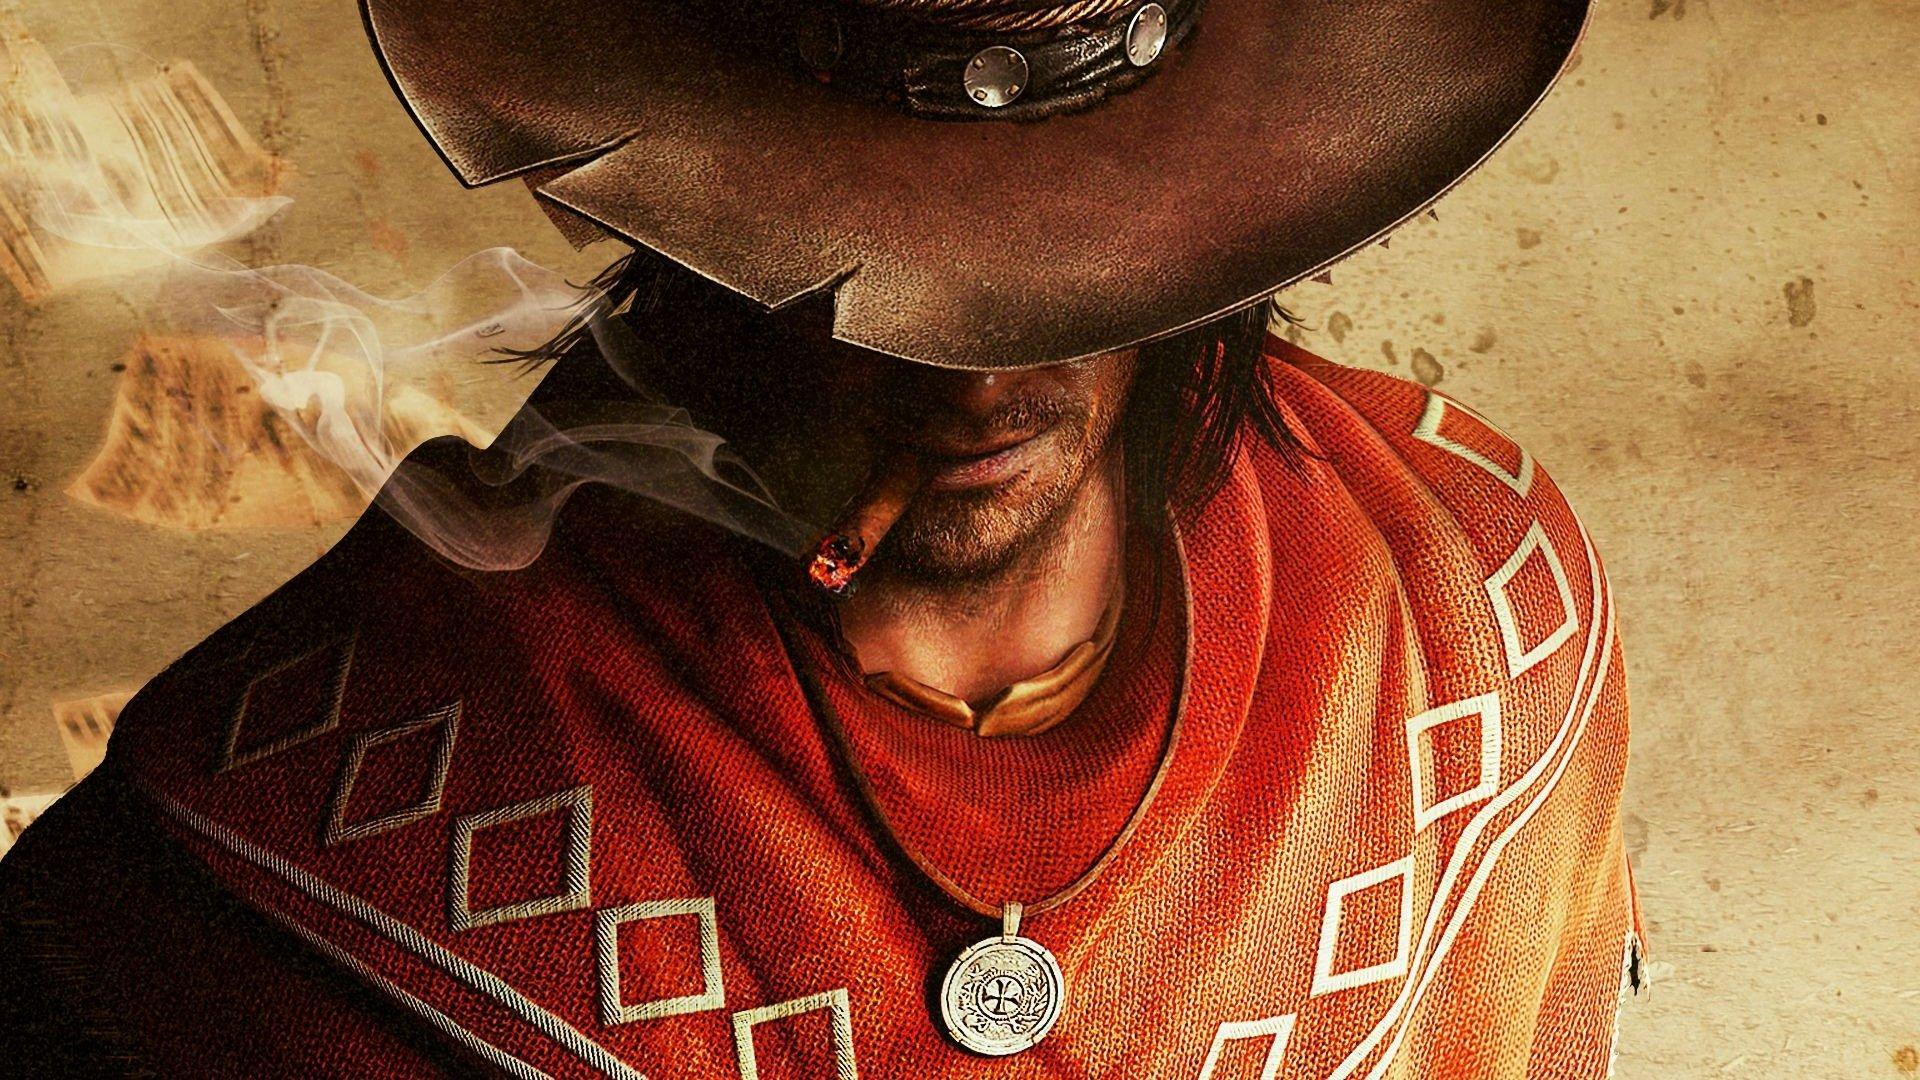 General 1920x1080 Call of Juarez - Gunslinger Call of Juarez® Gunslinger! cowboys western video games